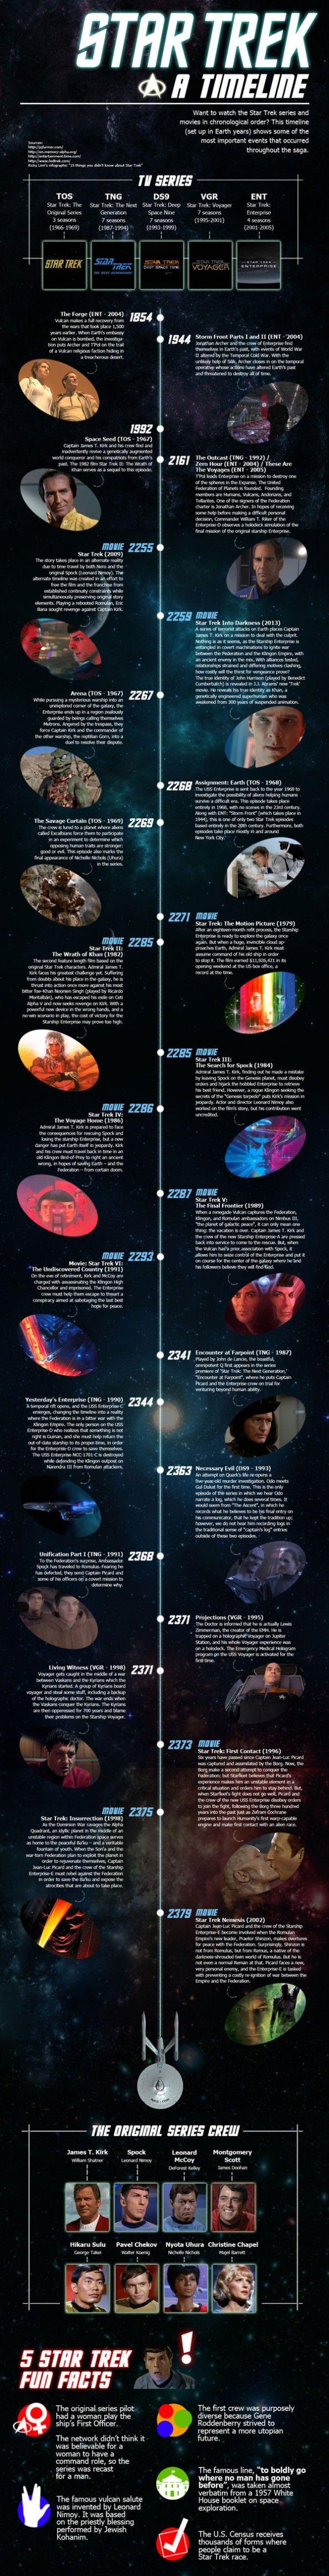 Star Trek Universe Timeline : universe, timeline, Ideas, Trek,, Universe